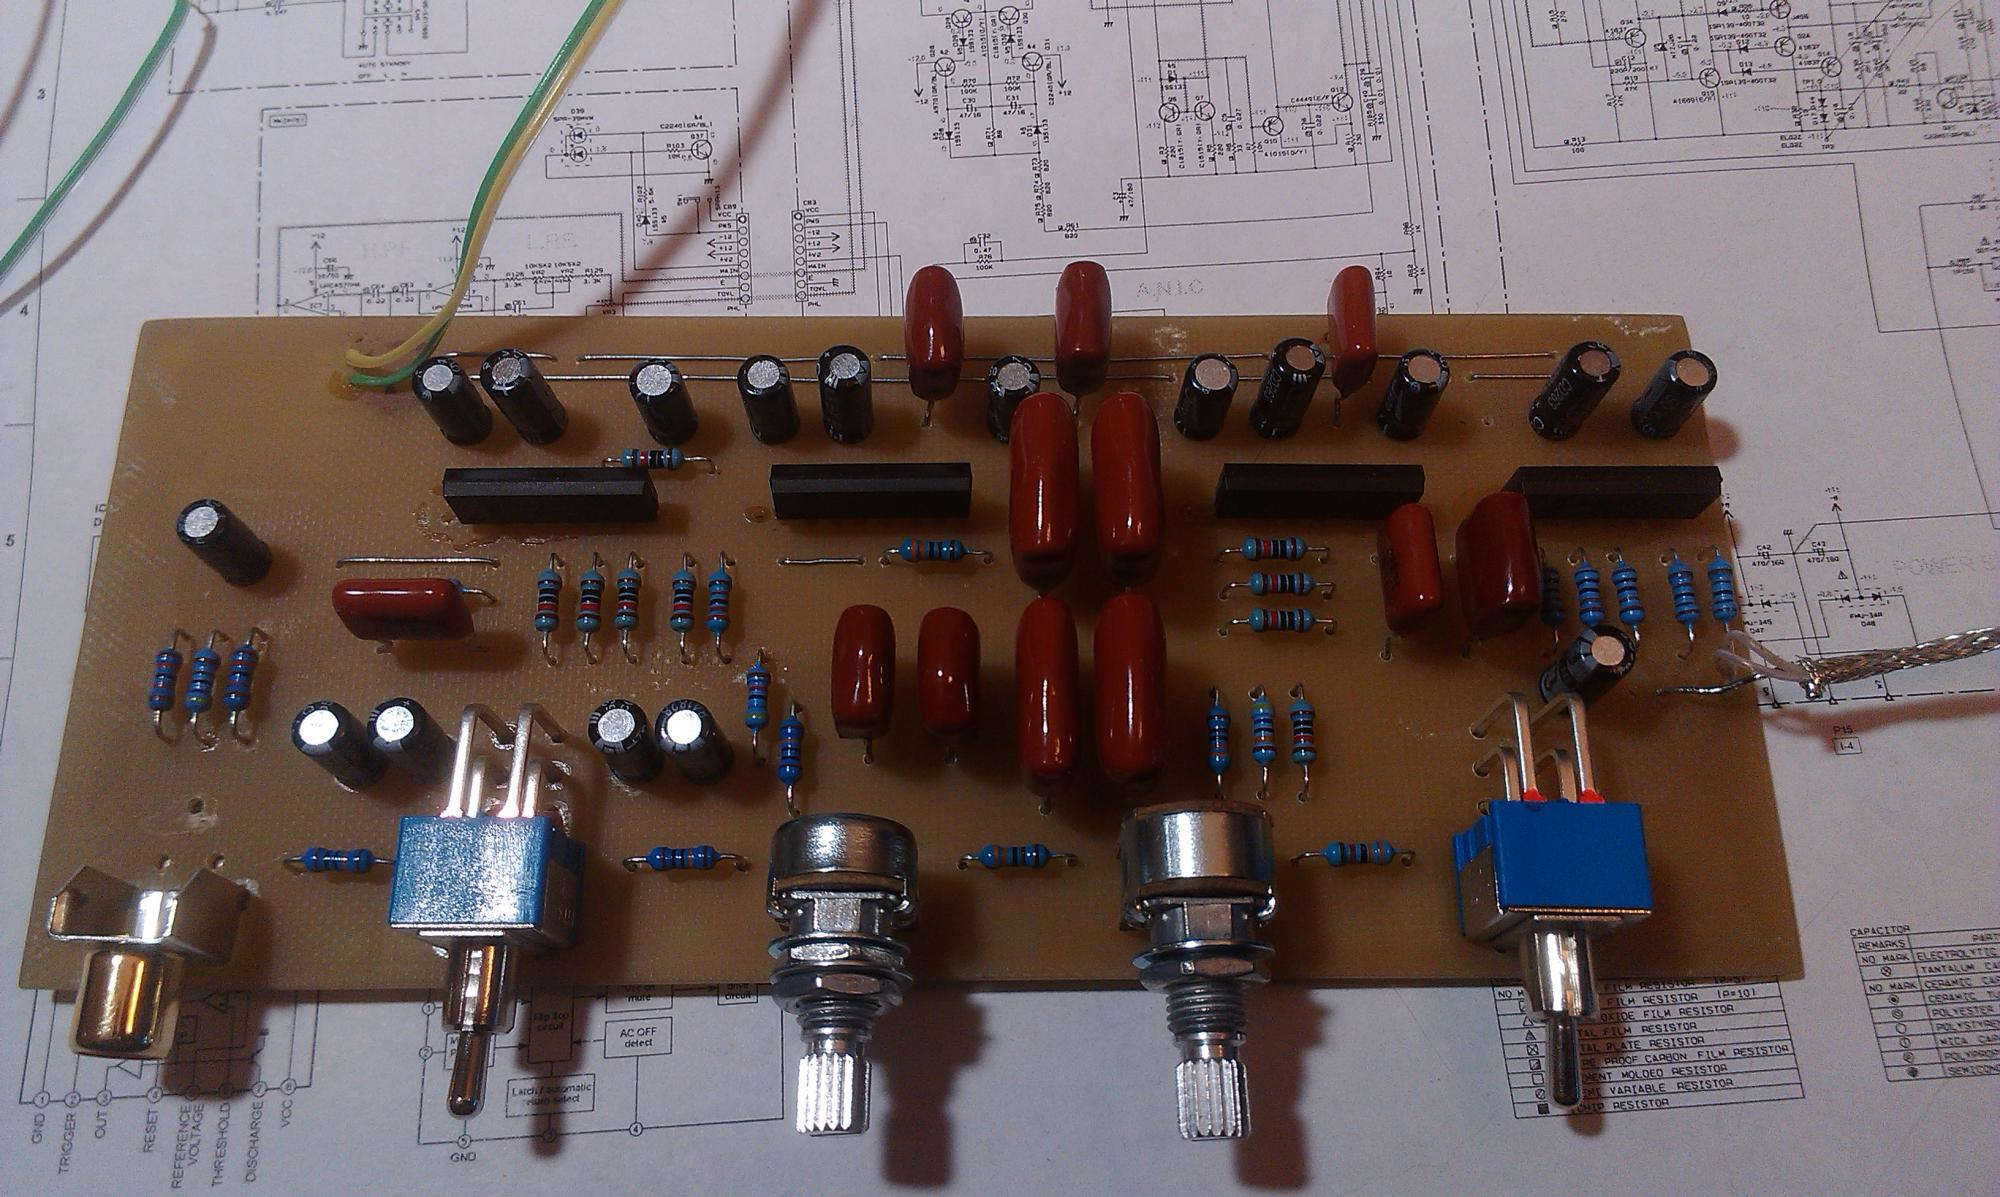 схема блок обработки сигнала саба